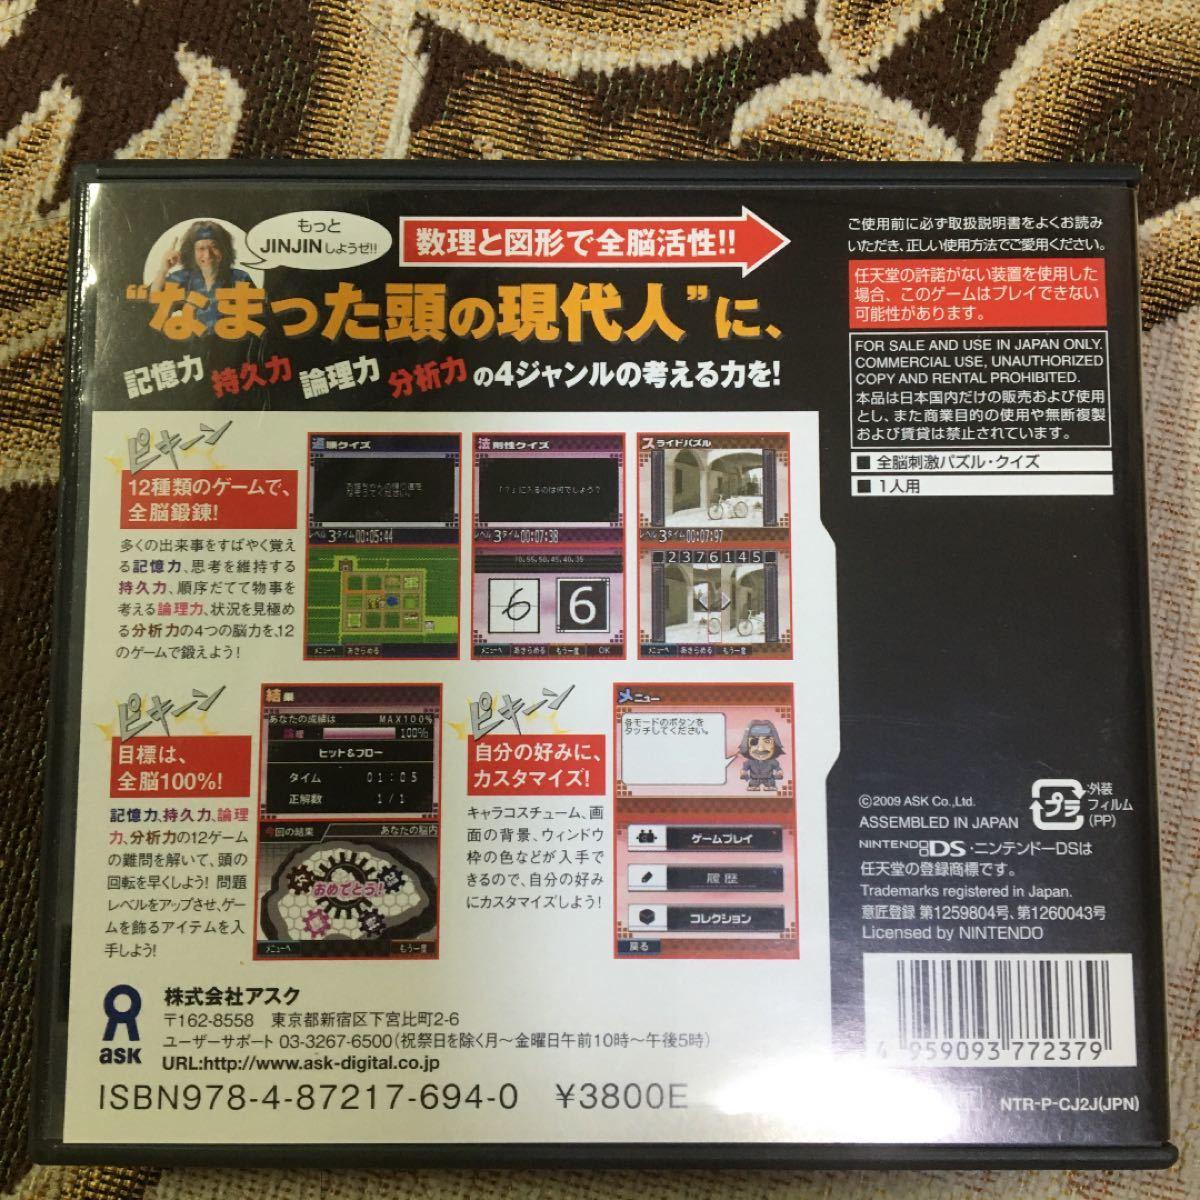 【DS】 全脳シリーズ Vol.3 秋山 仁教授監修 全脳JINJIN 2